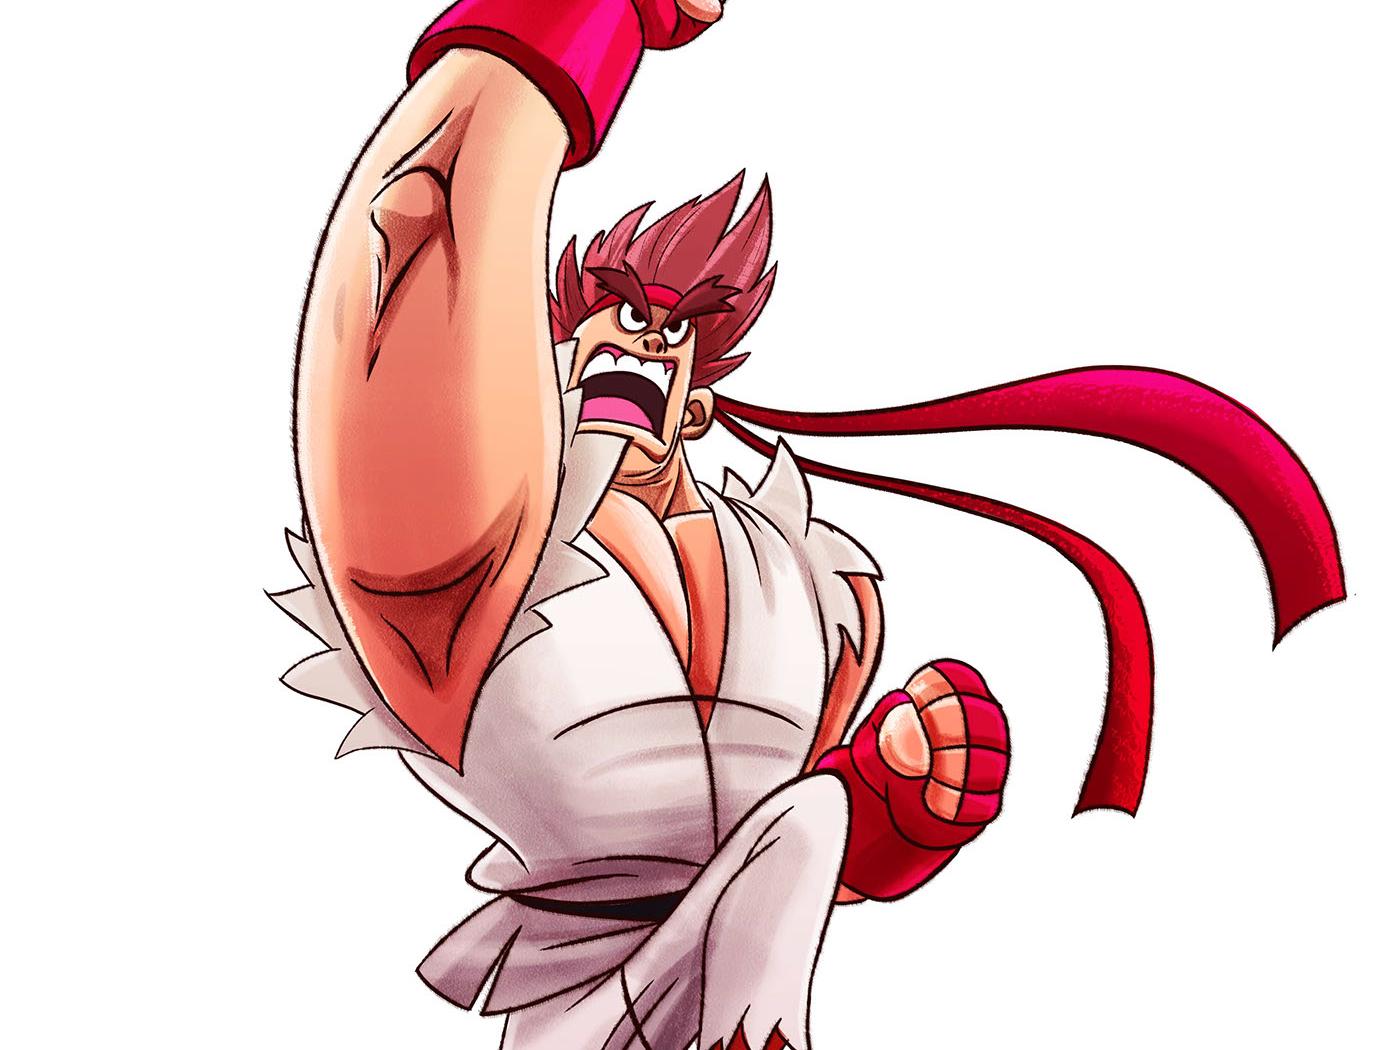 Ryu By Mithat Gökçe On Dribbble